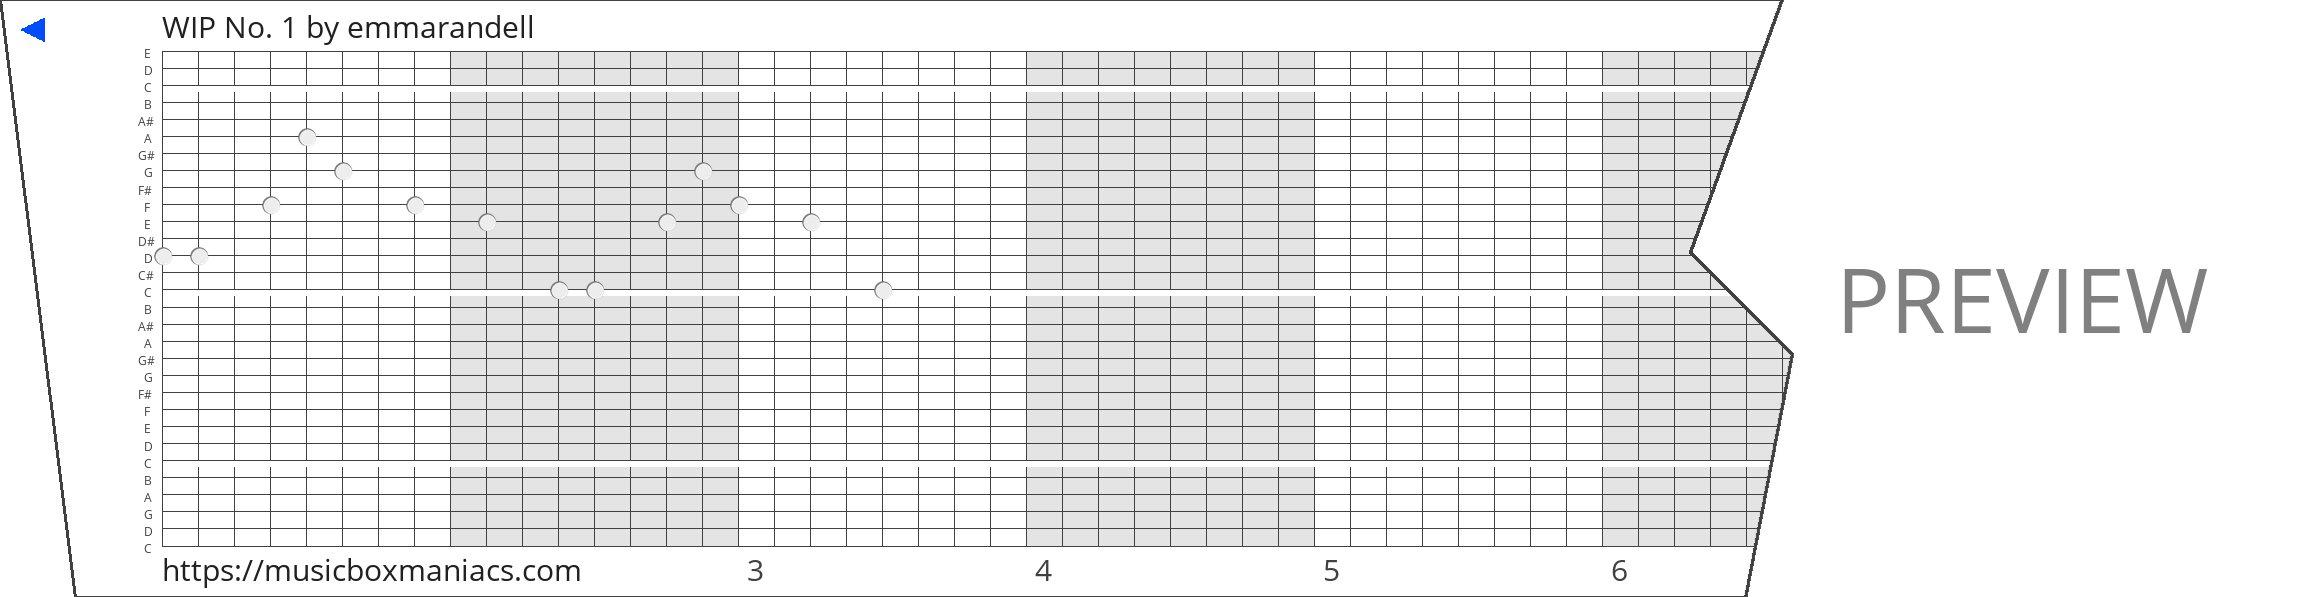 WIP No. 1 30 note music box paper strip